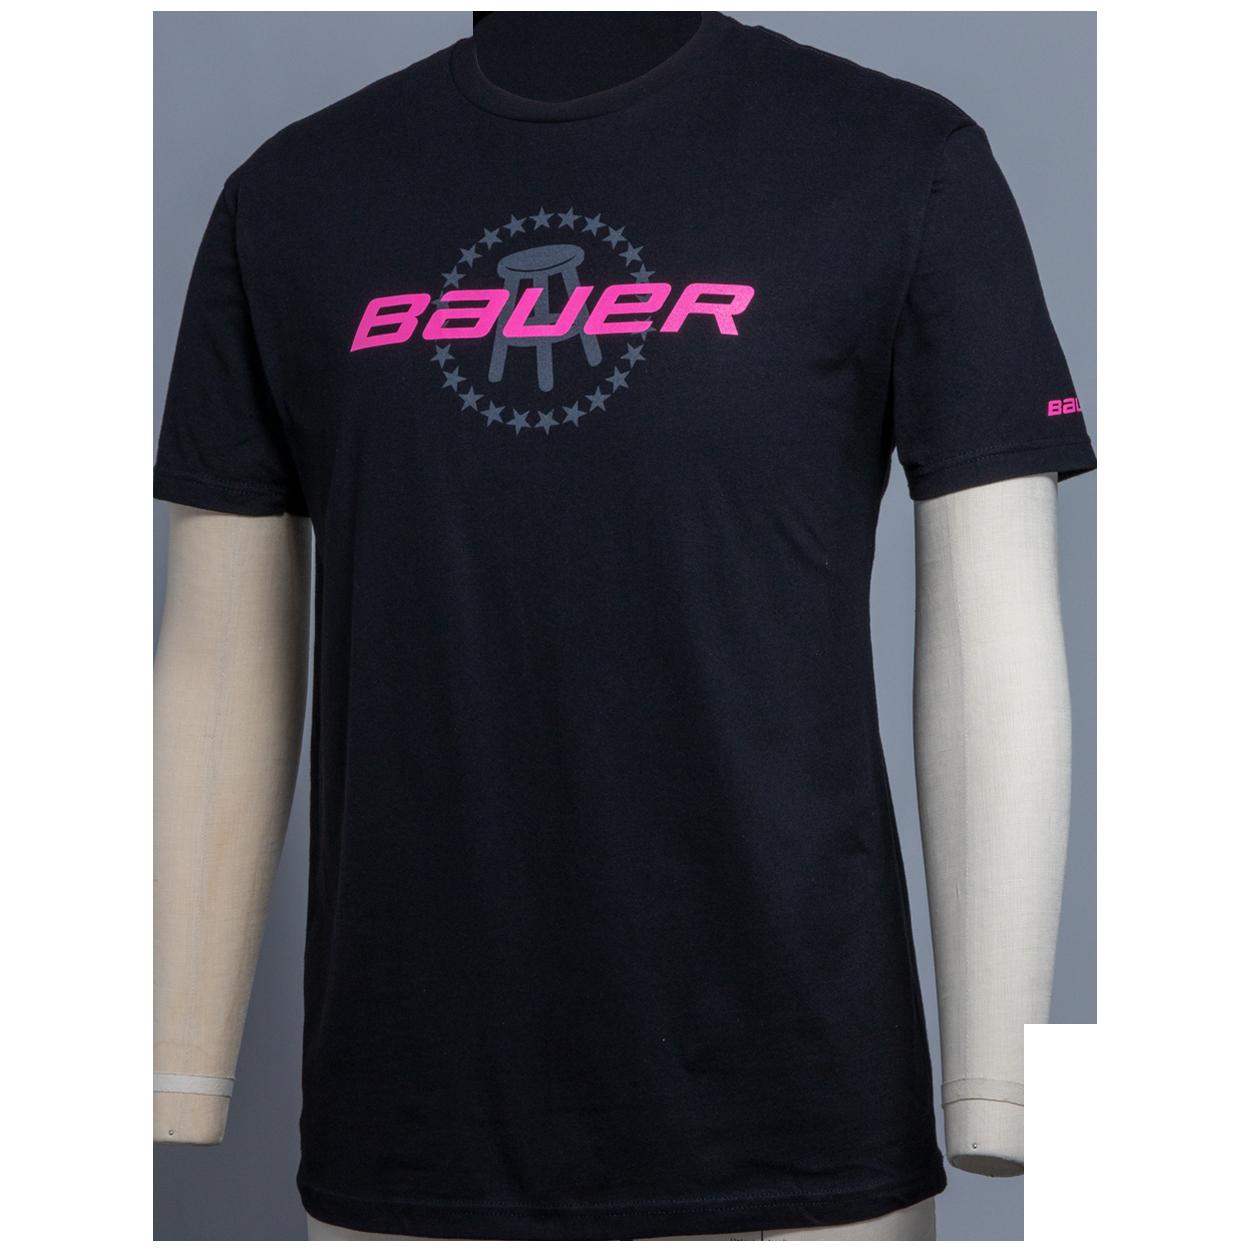 Bauer Barstool Co-Lab Pink T-Shirt,,medium